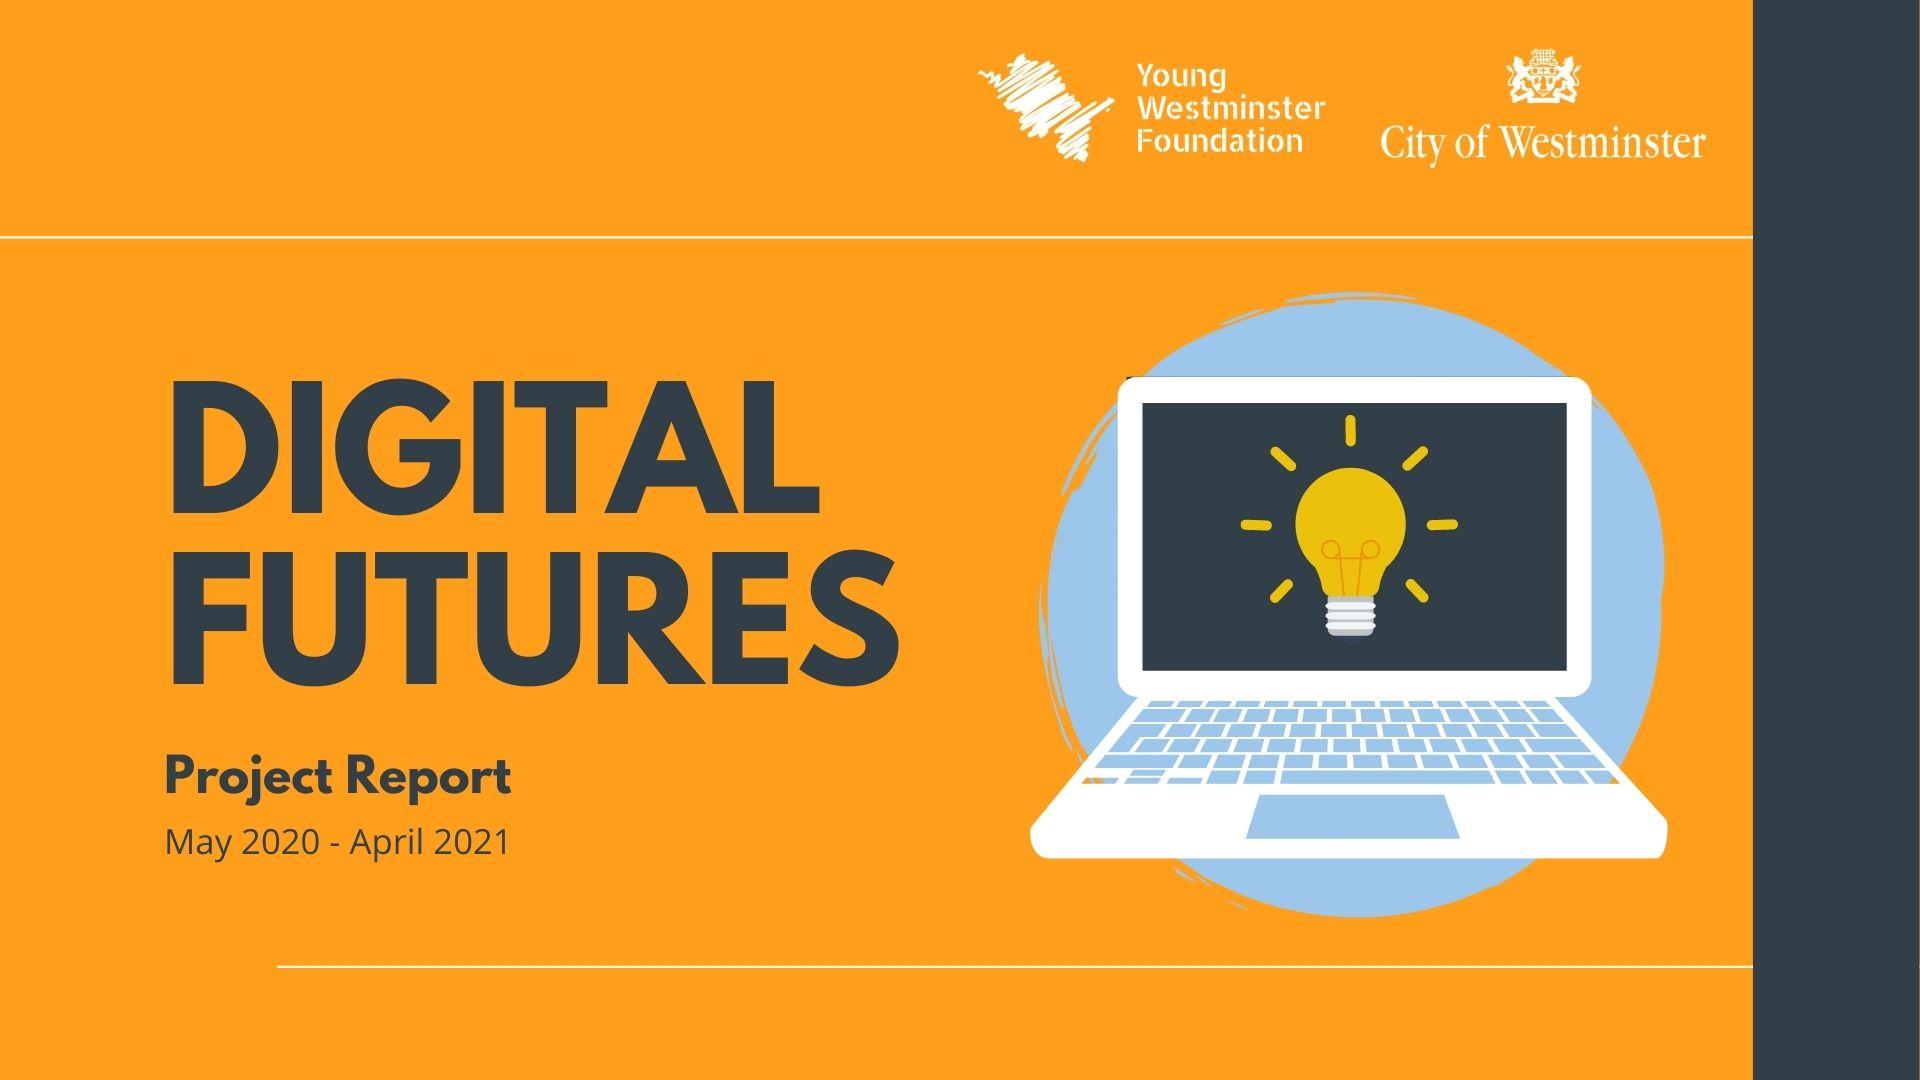 Digital Futures: What did we achieve?